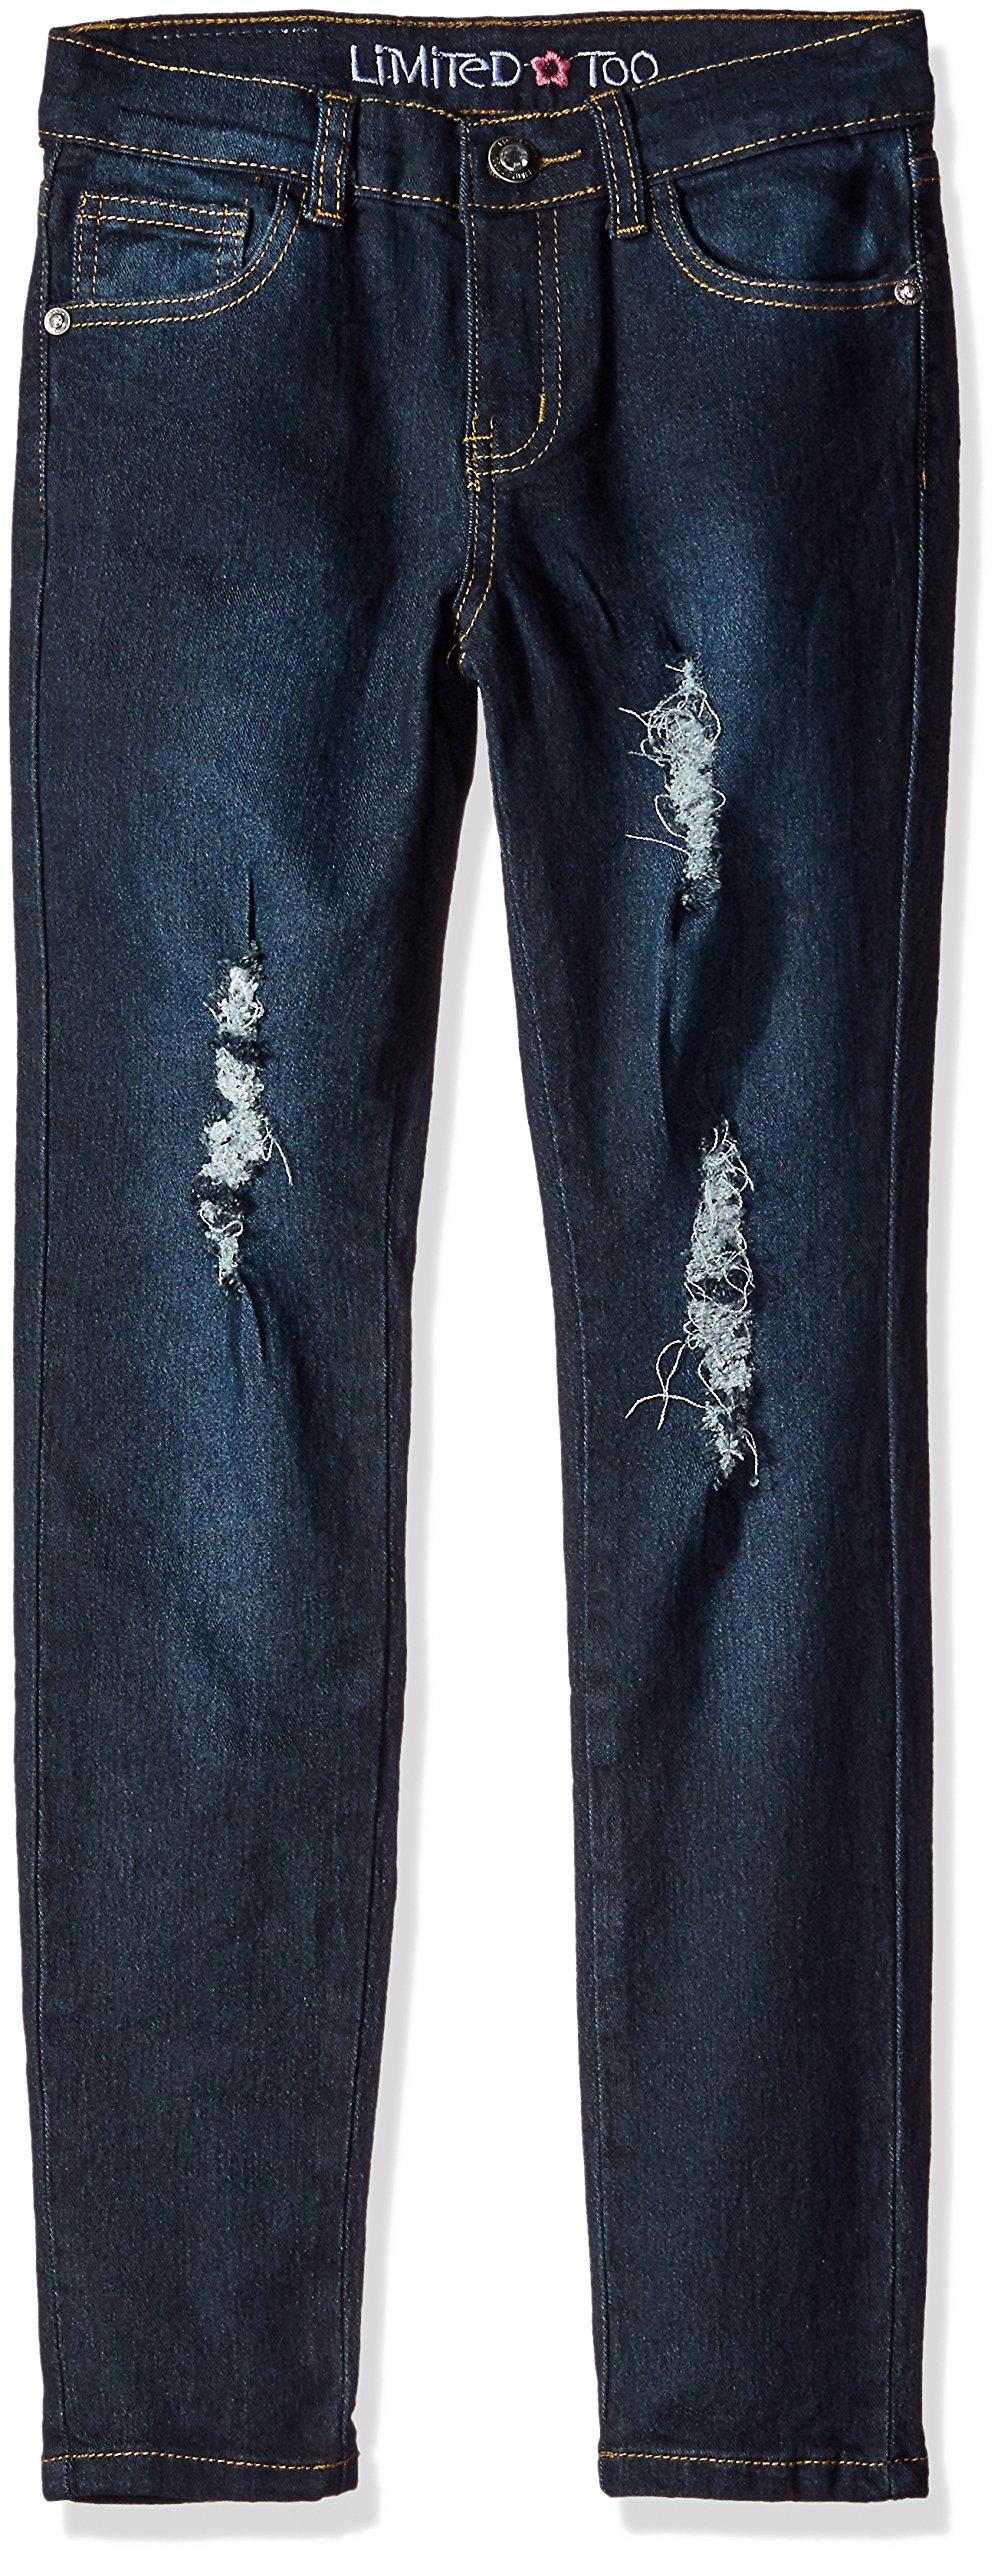 Limited Too Girls' Skinny Jean,1619 Blue Black Denim,14